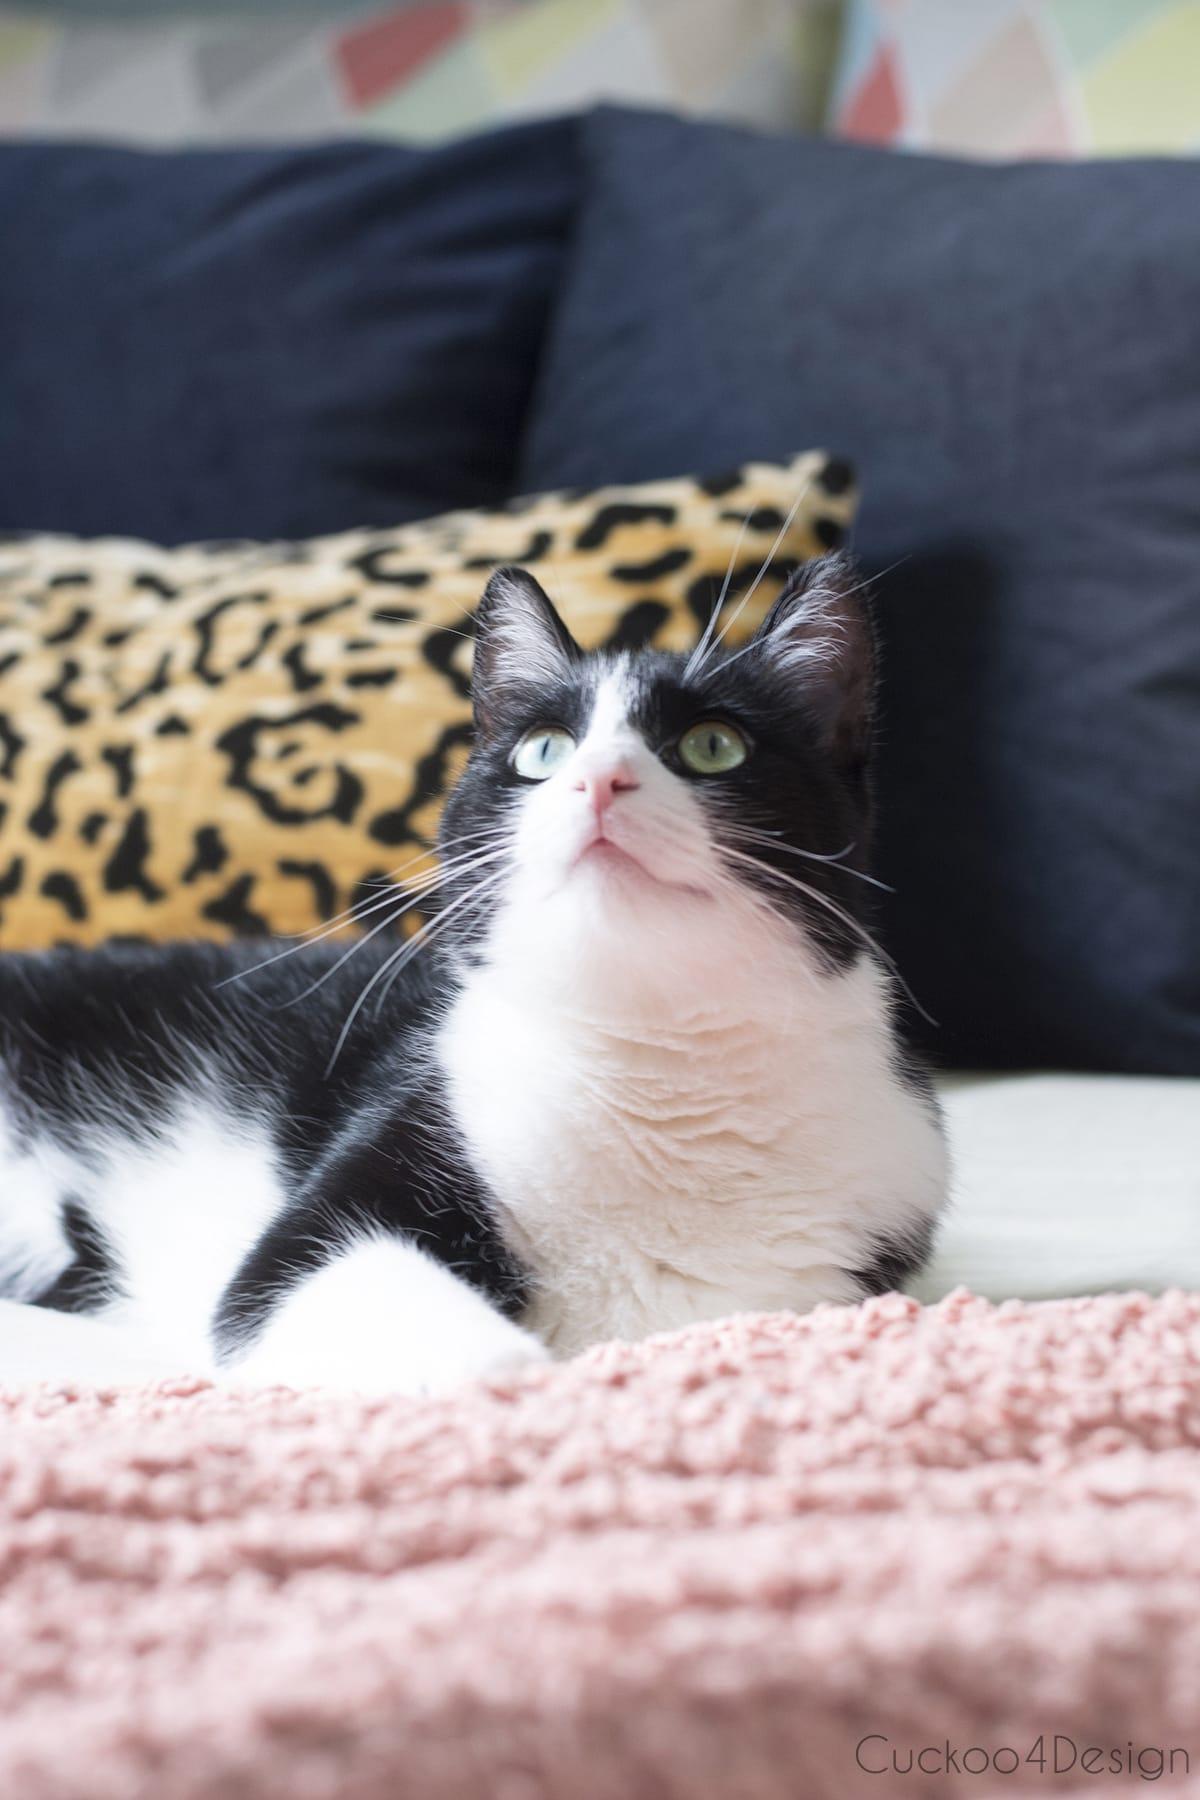 Willy the tuxedo cat